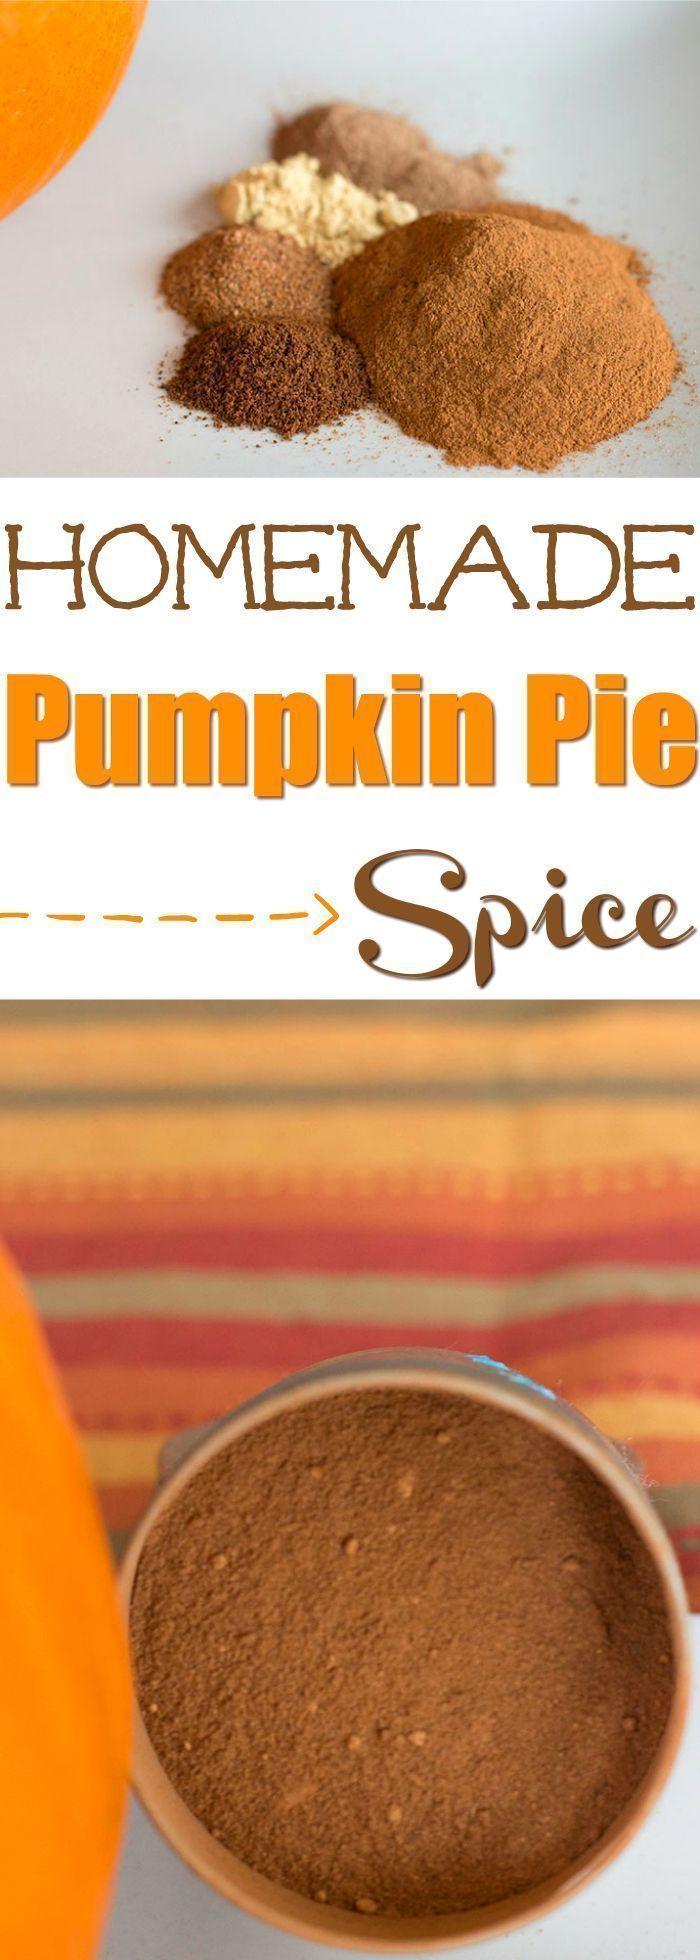 Homemade Pumpkin Pie Spice Recipe Homemade pumpkin pie